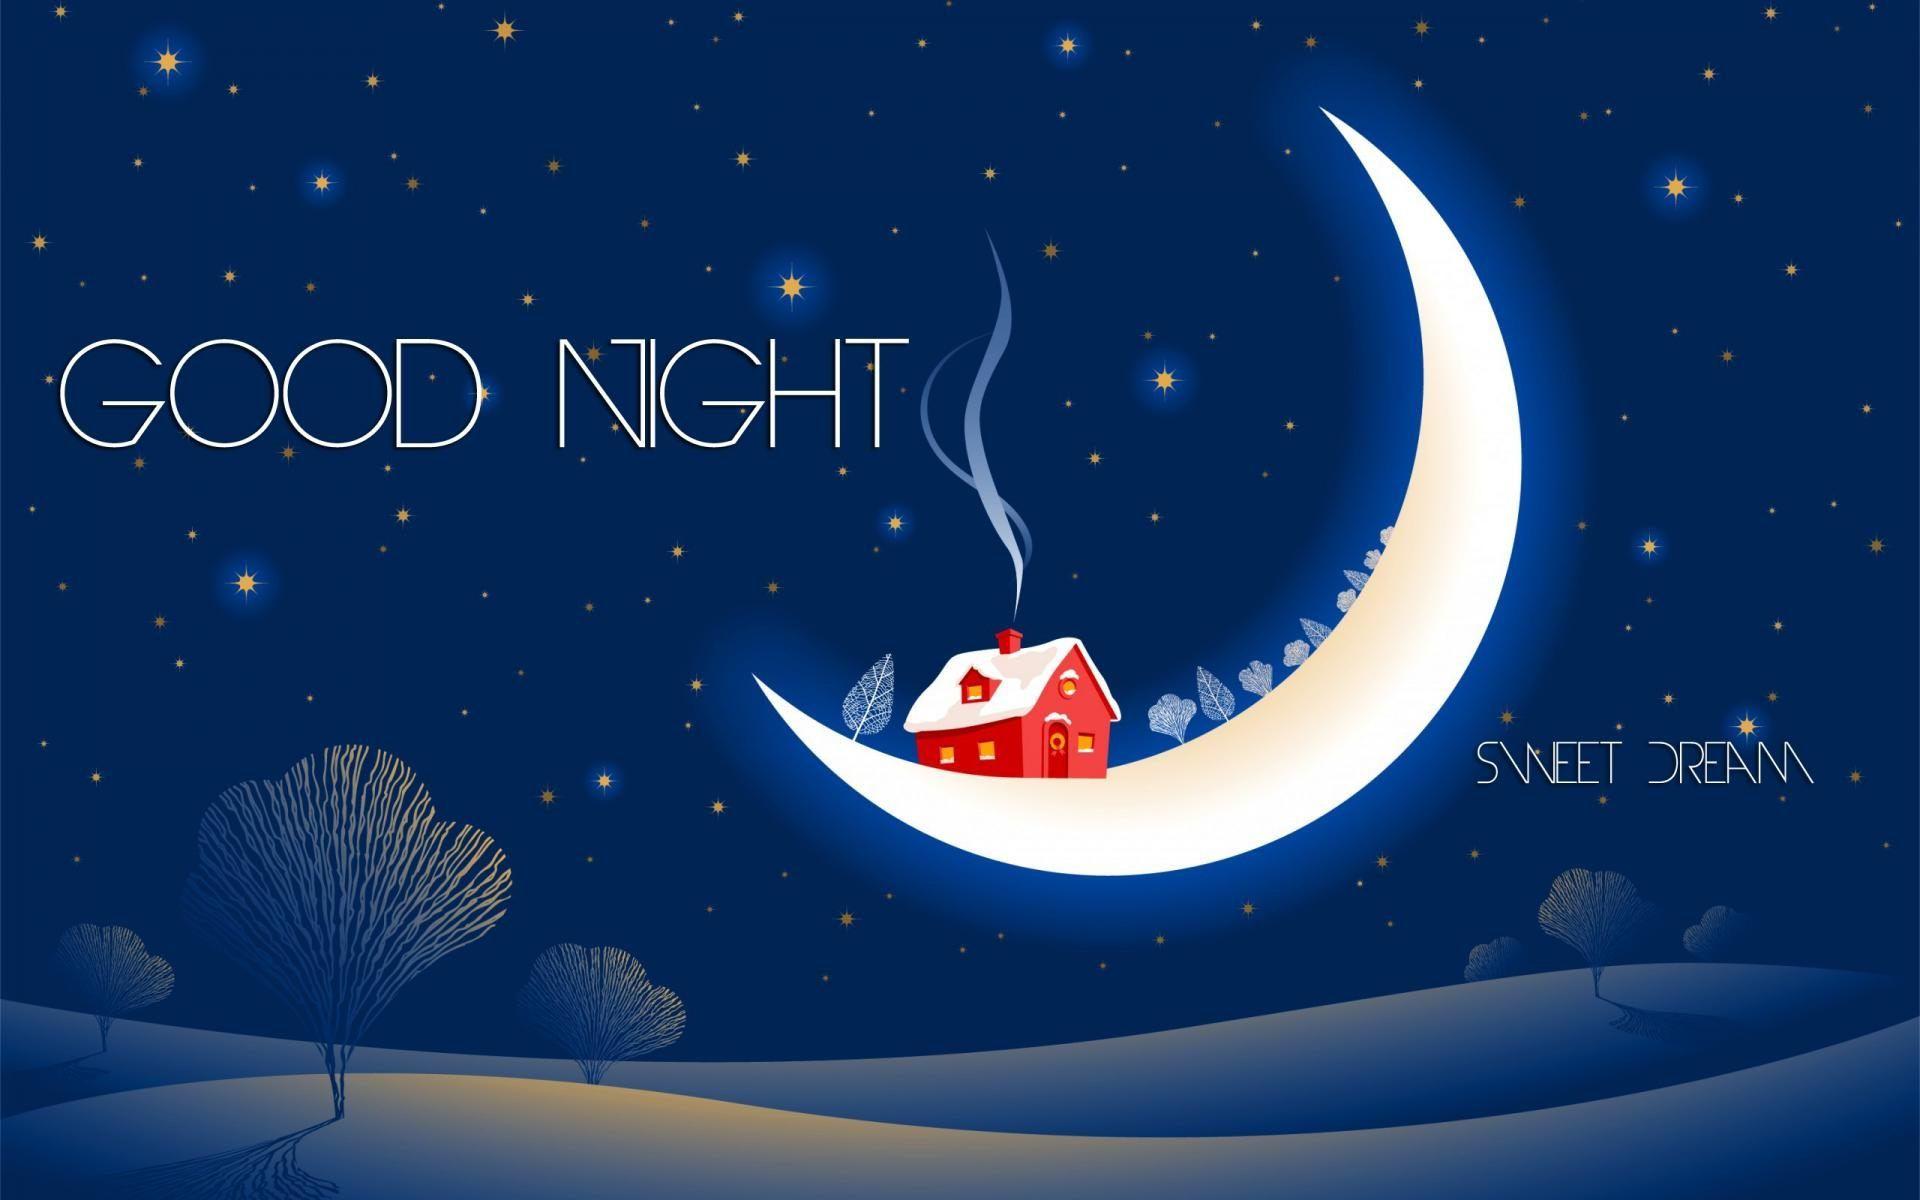 Night Sky Stars Wallpaper Mobile For Desktop x px .